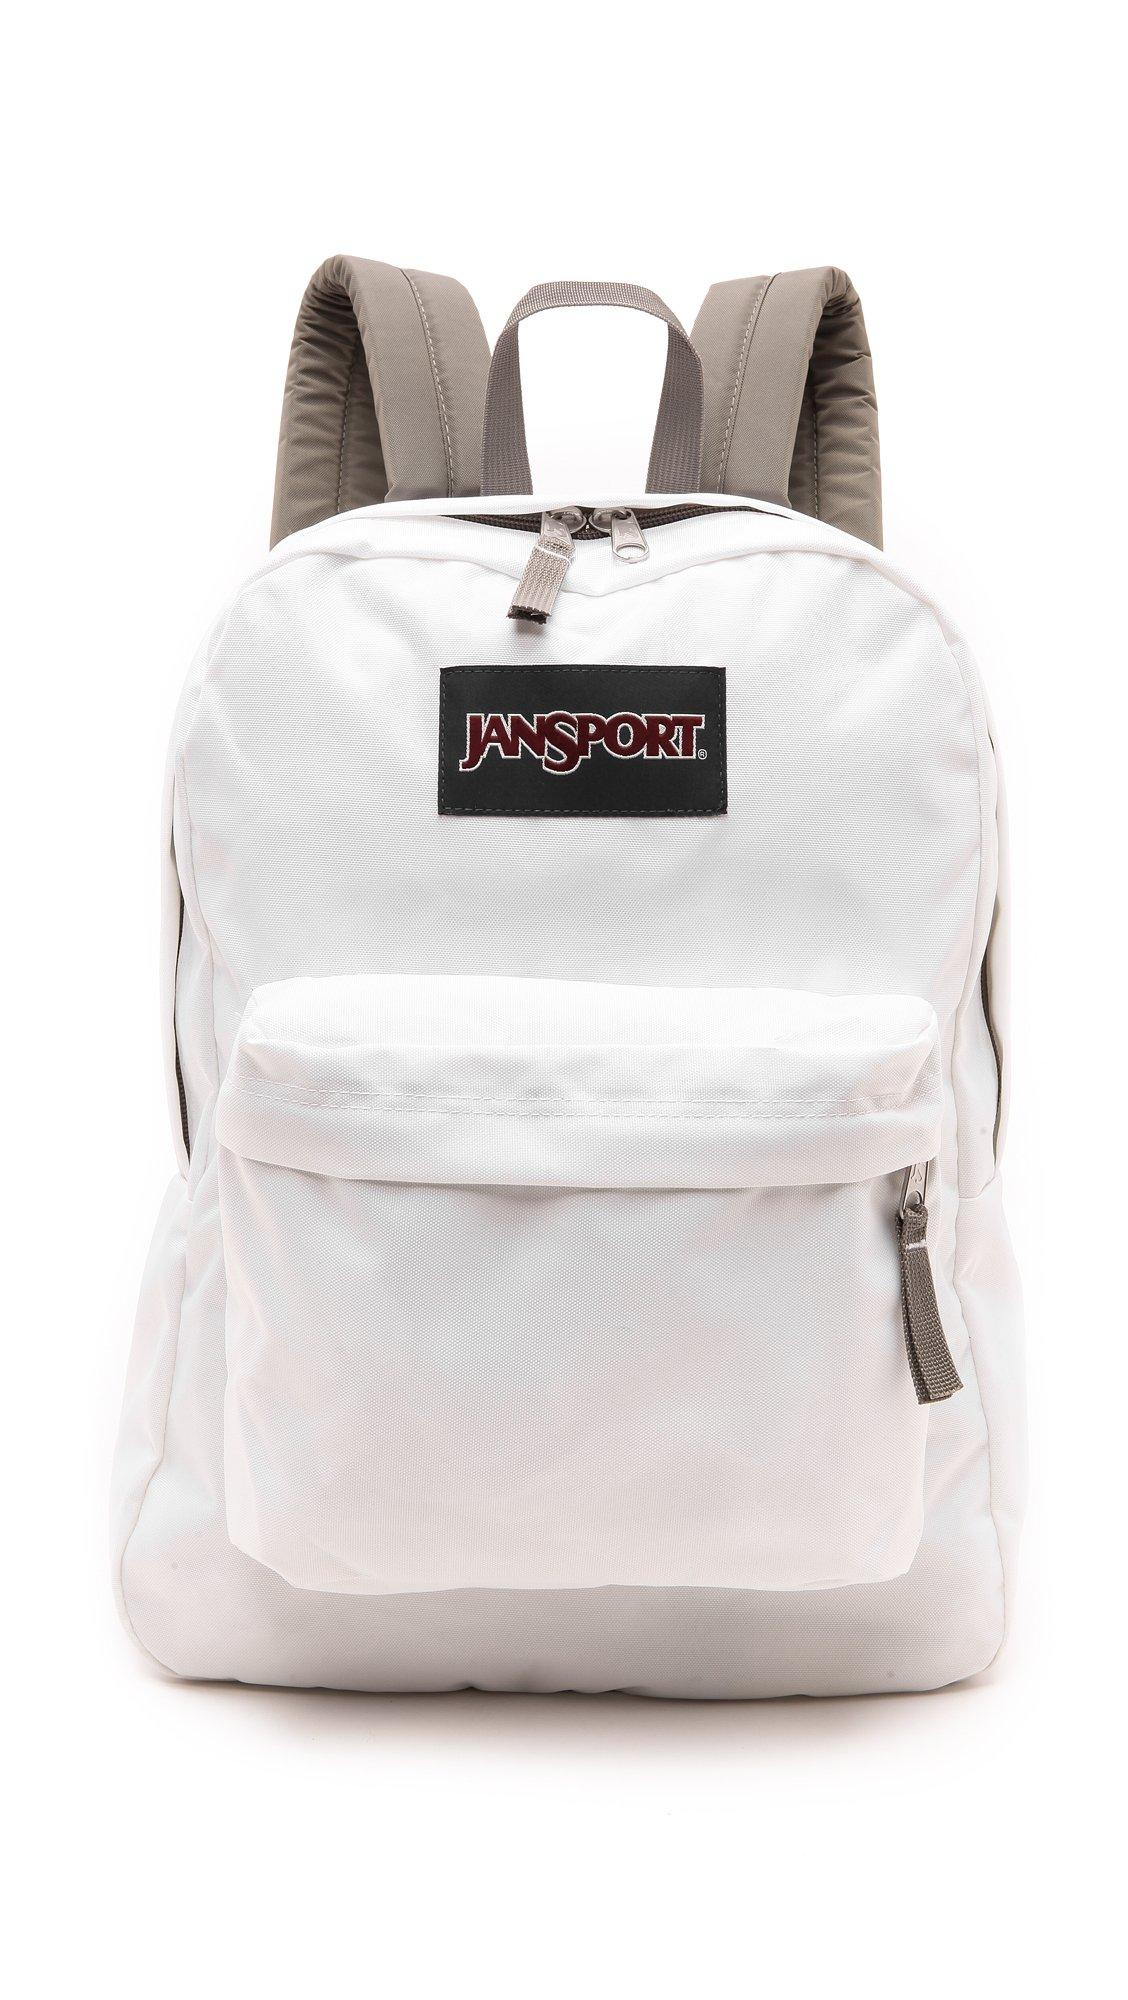 Jansport Backpack Superbreak Black 51353 (White)